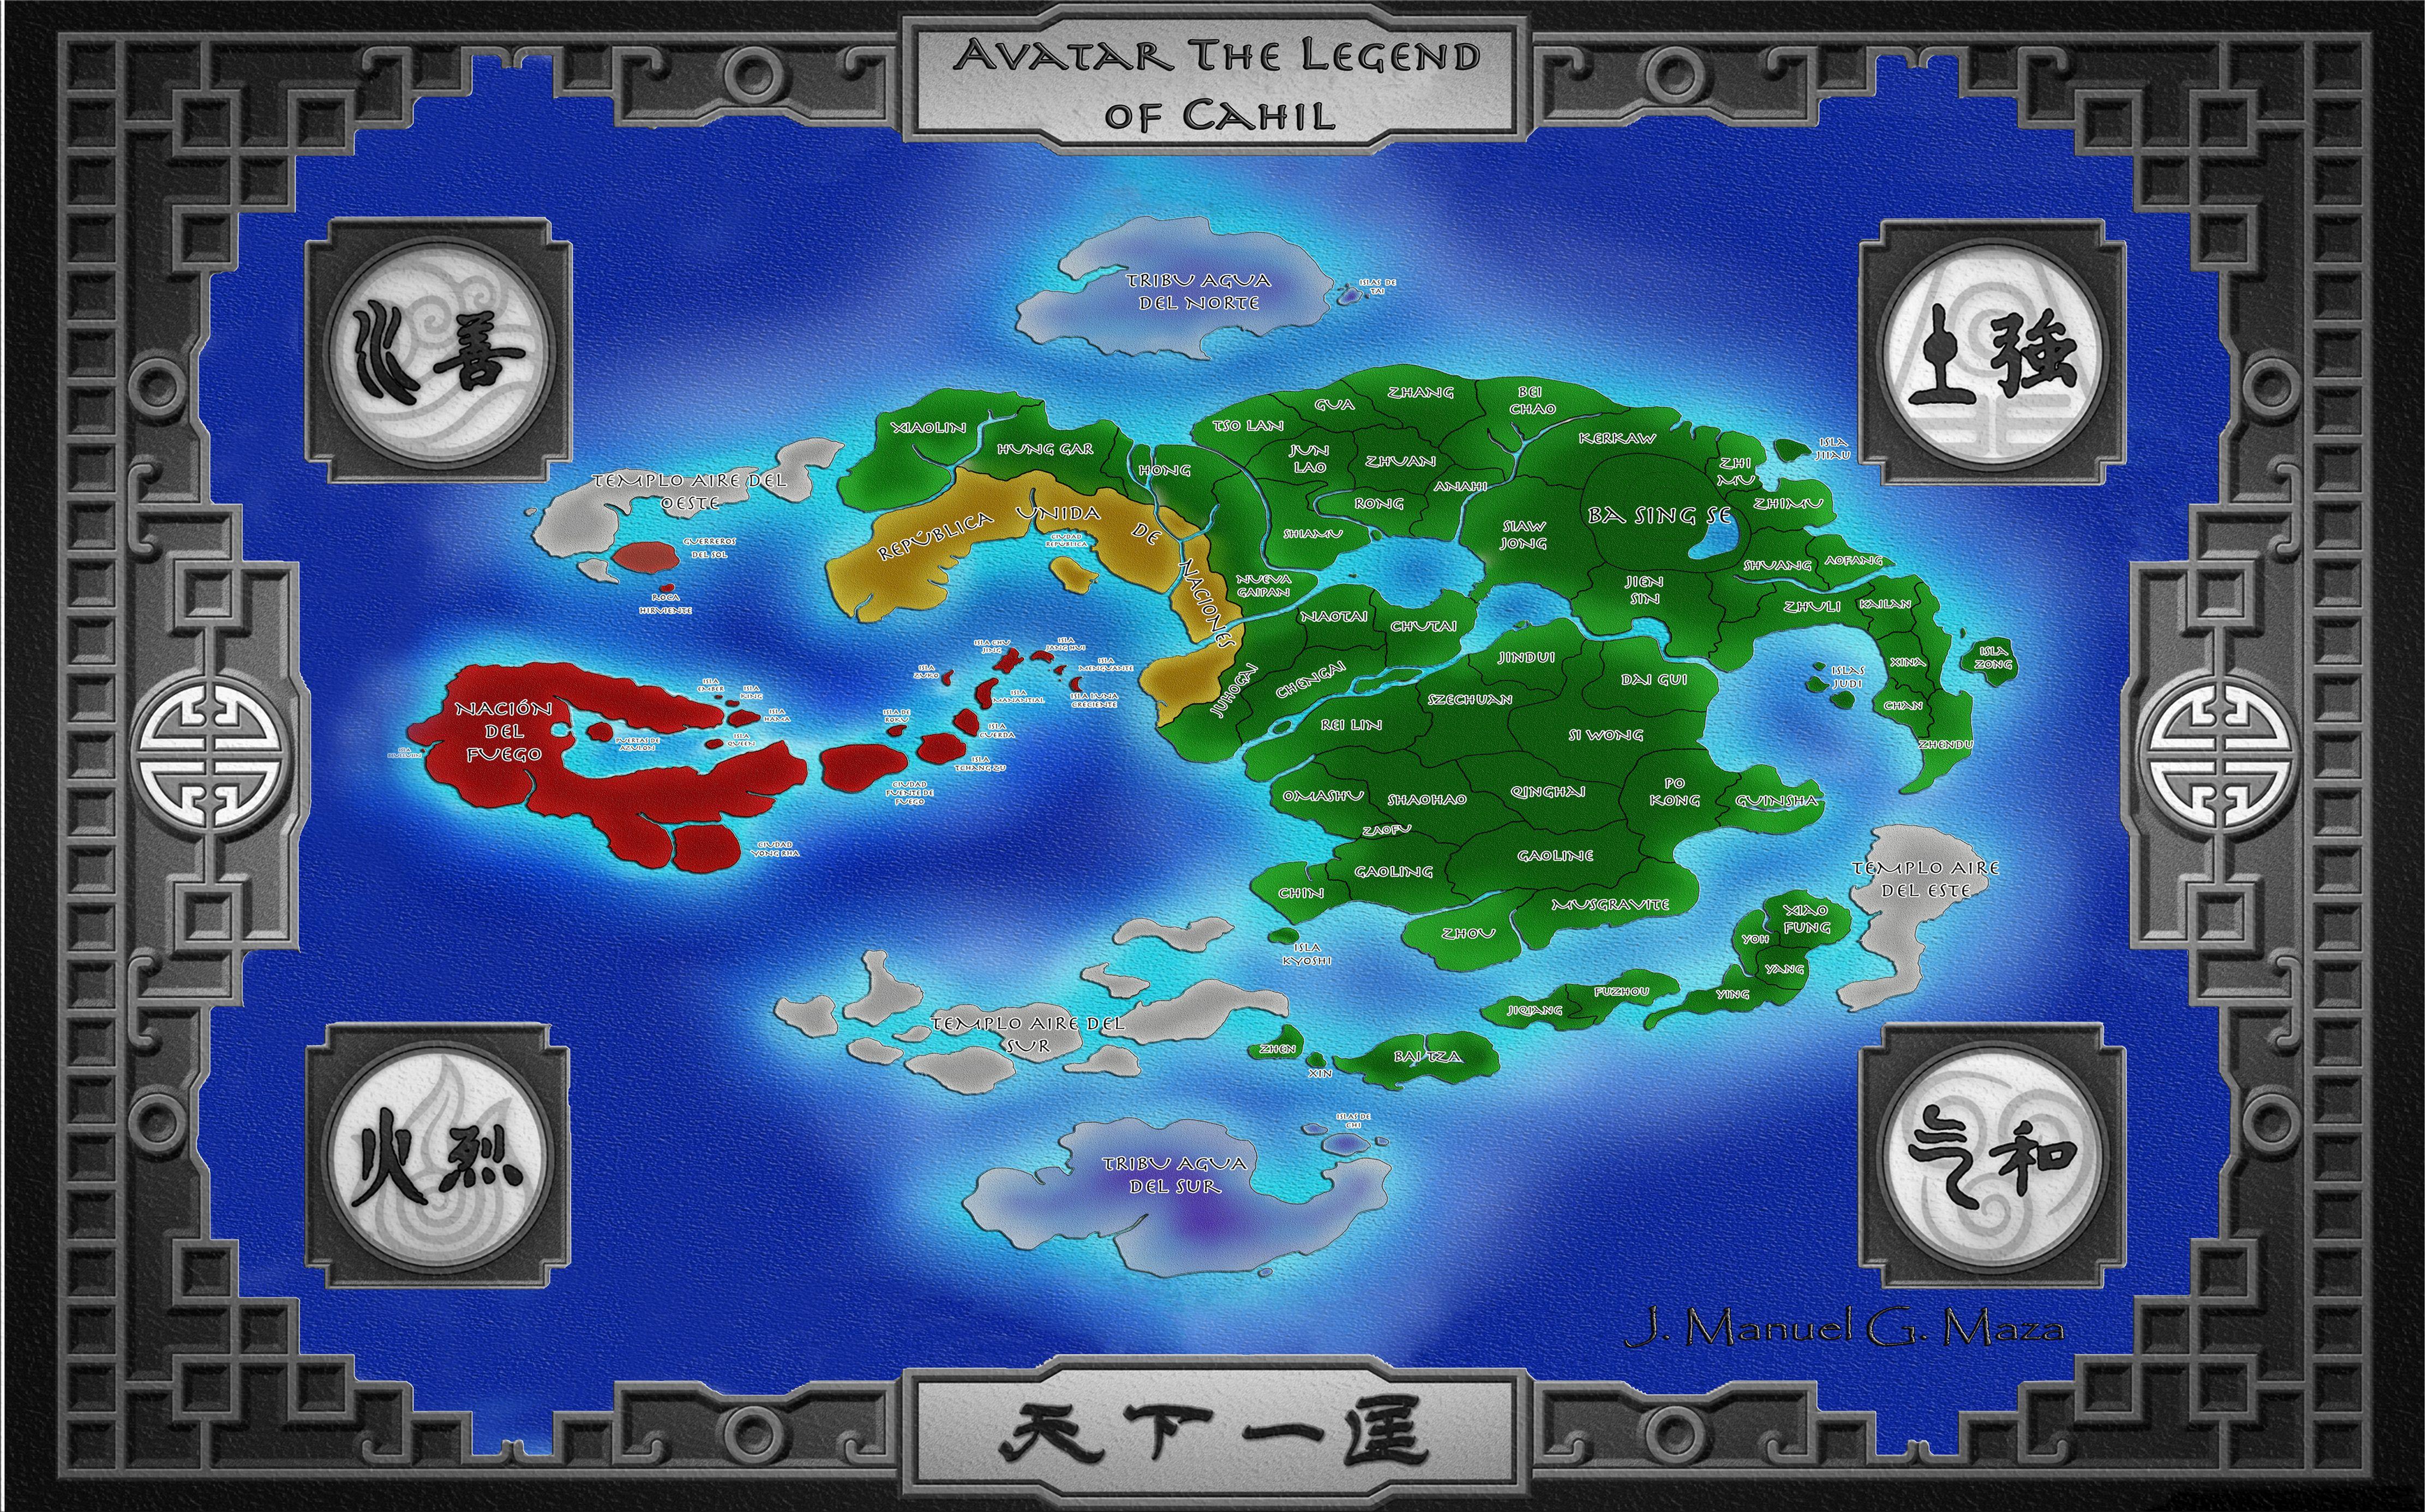 Pin de Curtis Haddrill em Avatar | Avatar, Mapa, A lenda